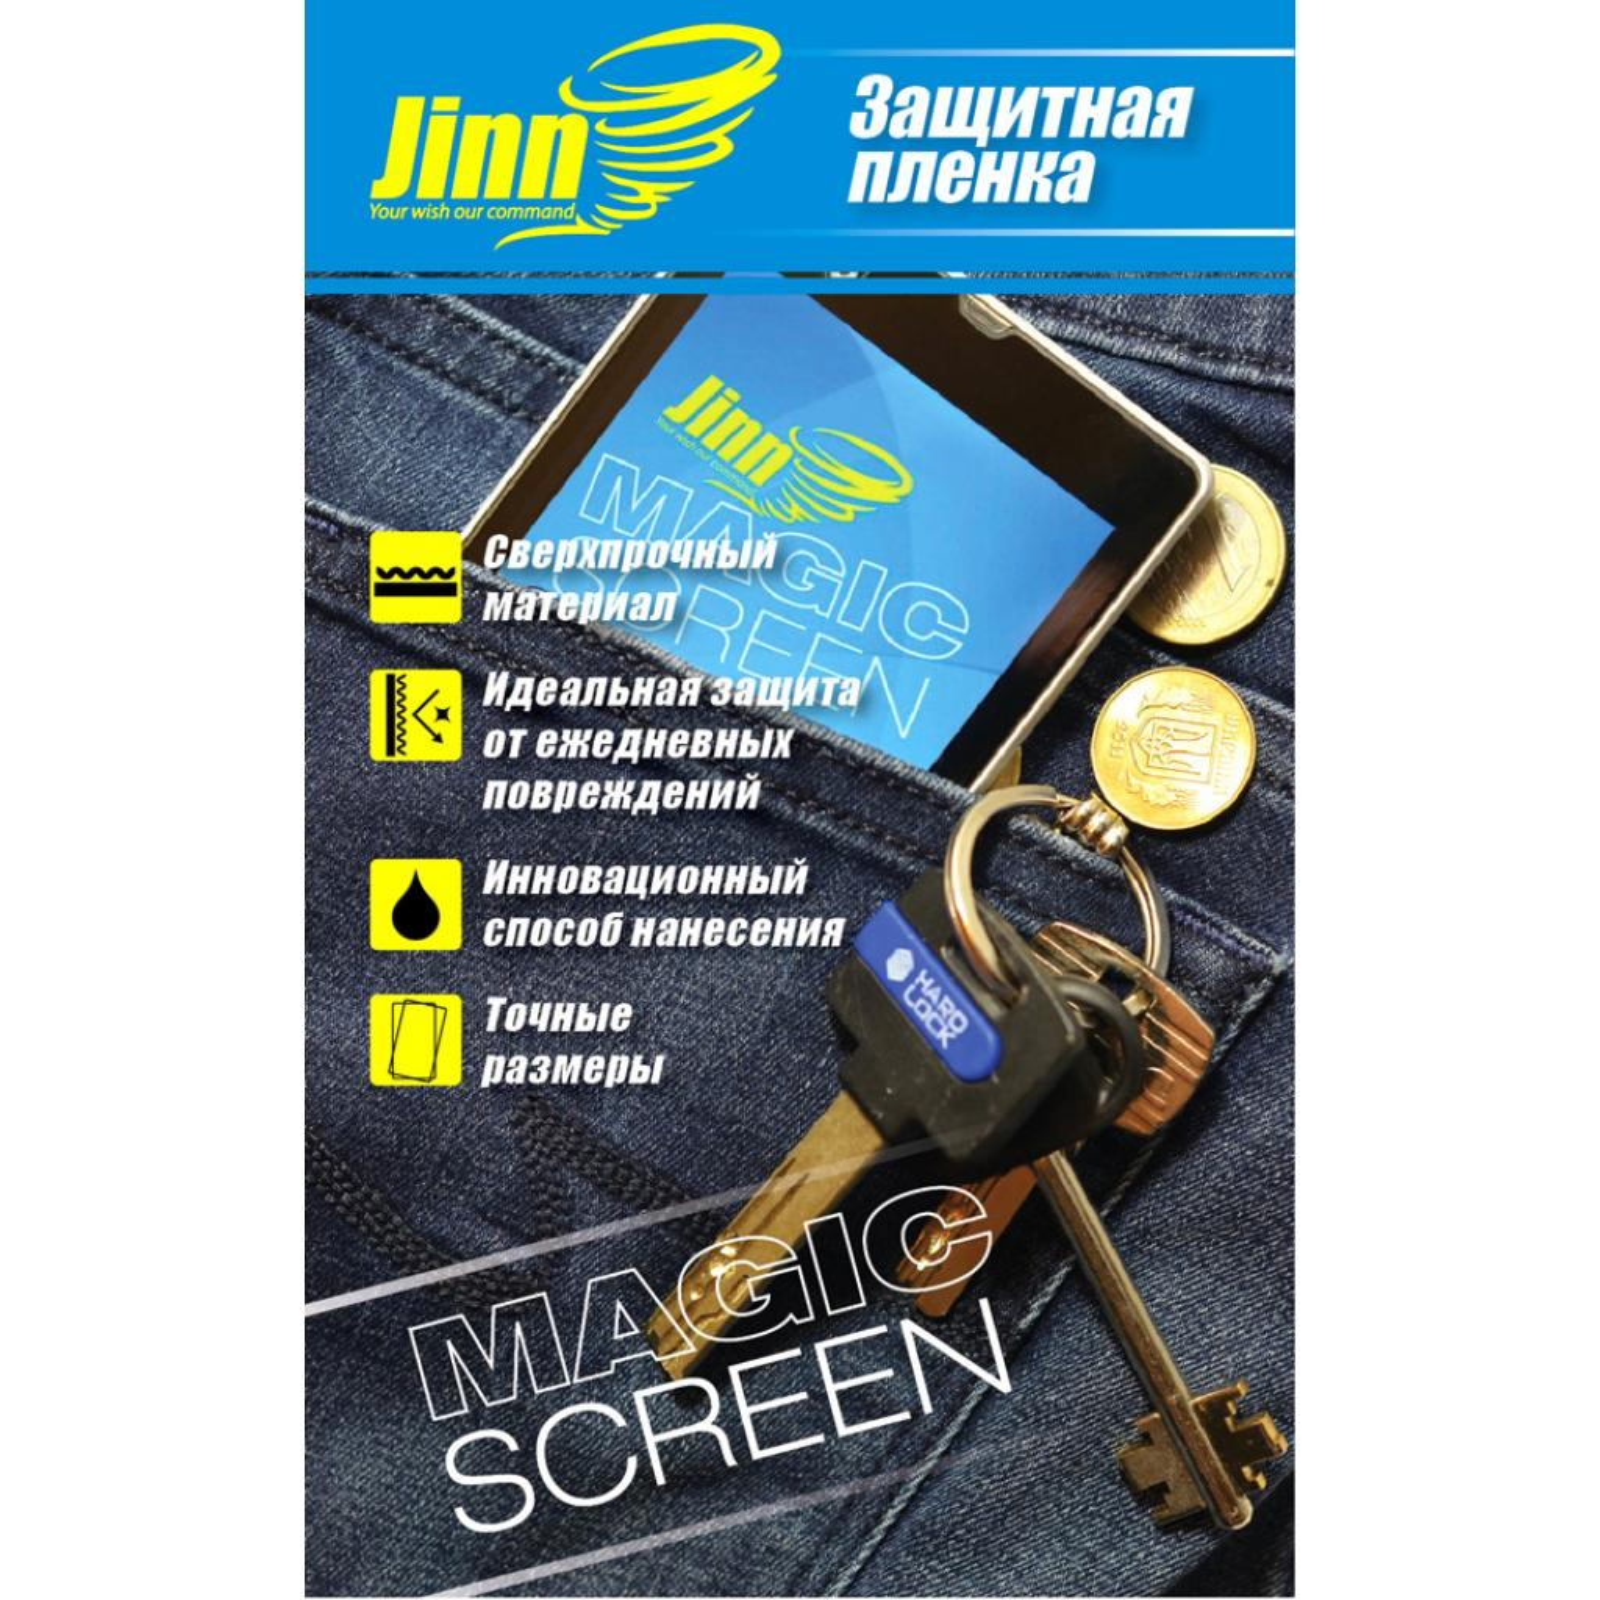 Пленка защитная JINN ультрапрочная Magic Screen для Lenovo IdeaPhone S720 (Lenovo IdeaPhone S720 front)